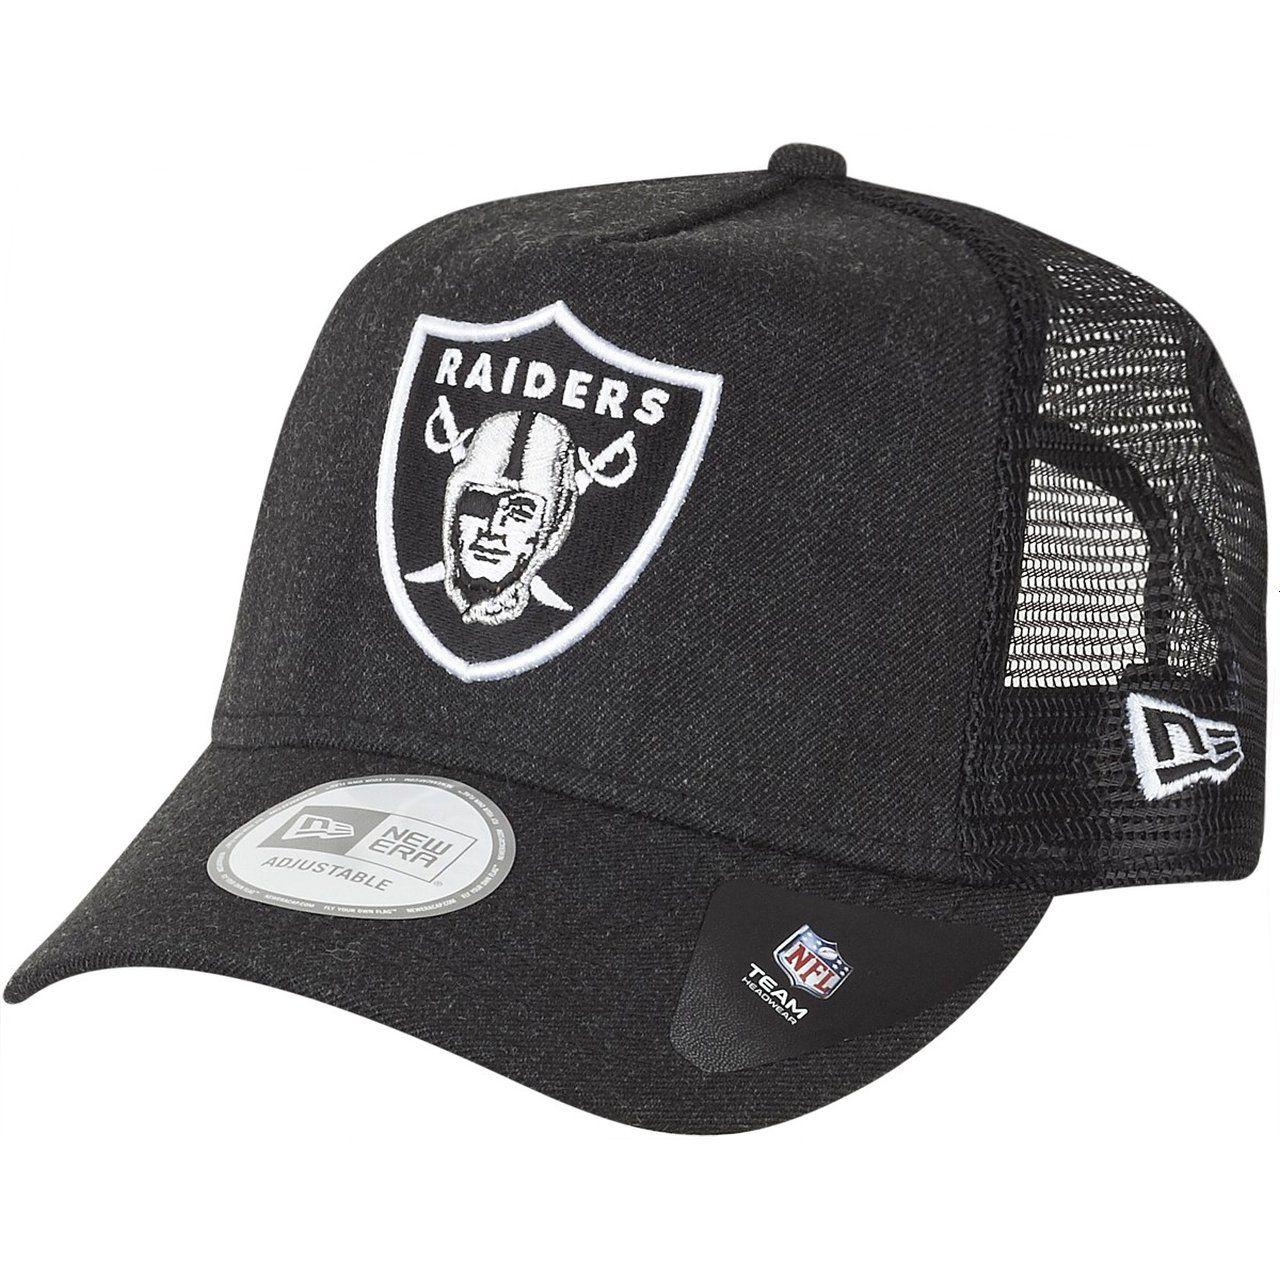 amfoo - New Era Adjustable Trucker Cap - HEATHER Oakland Raiders